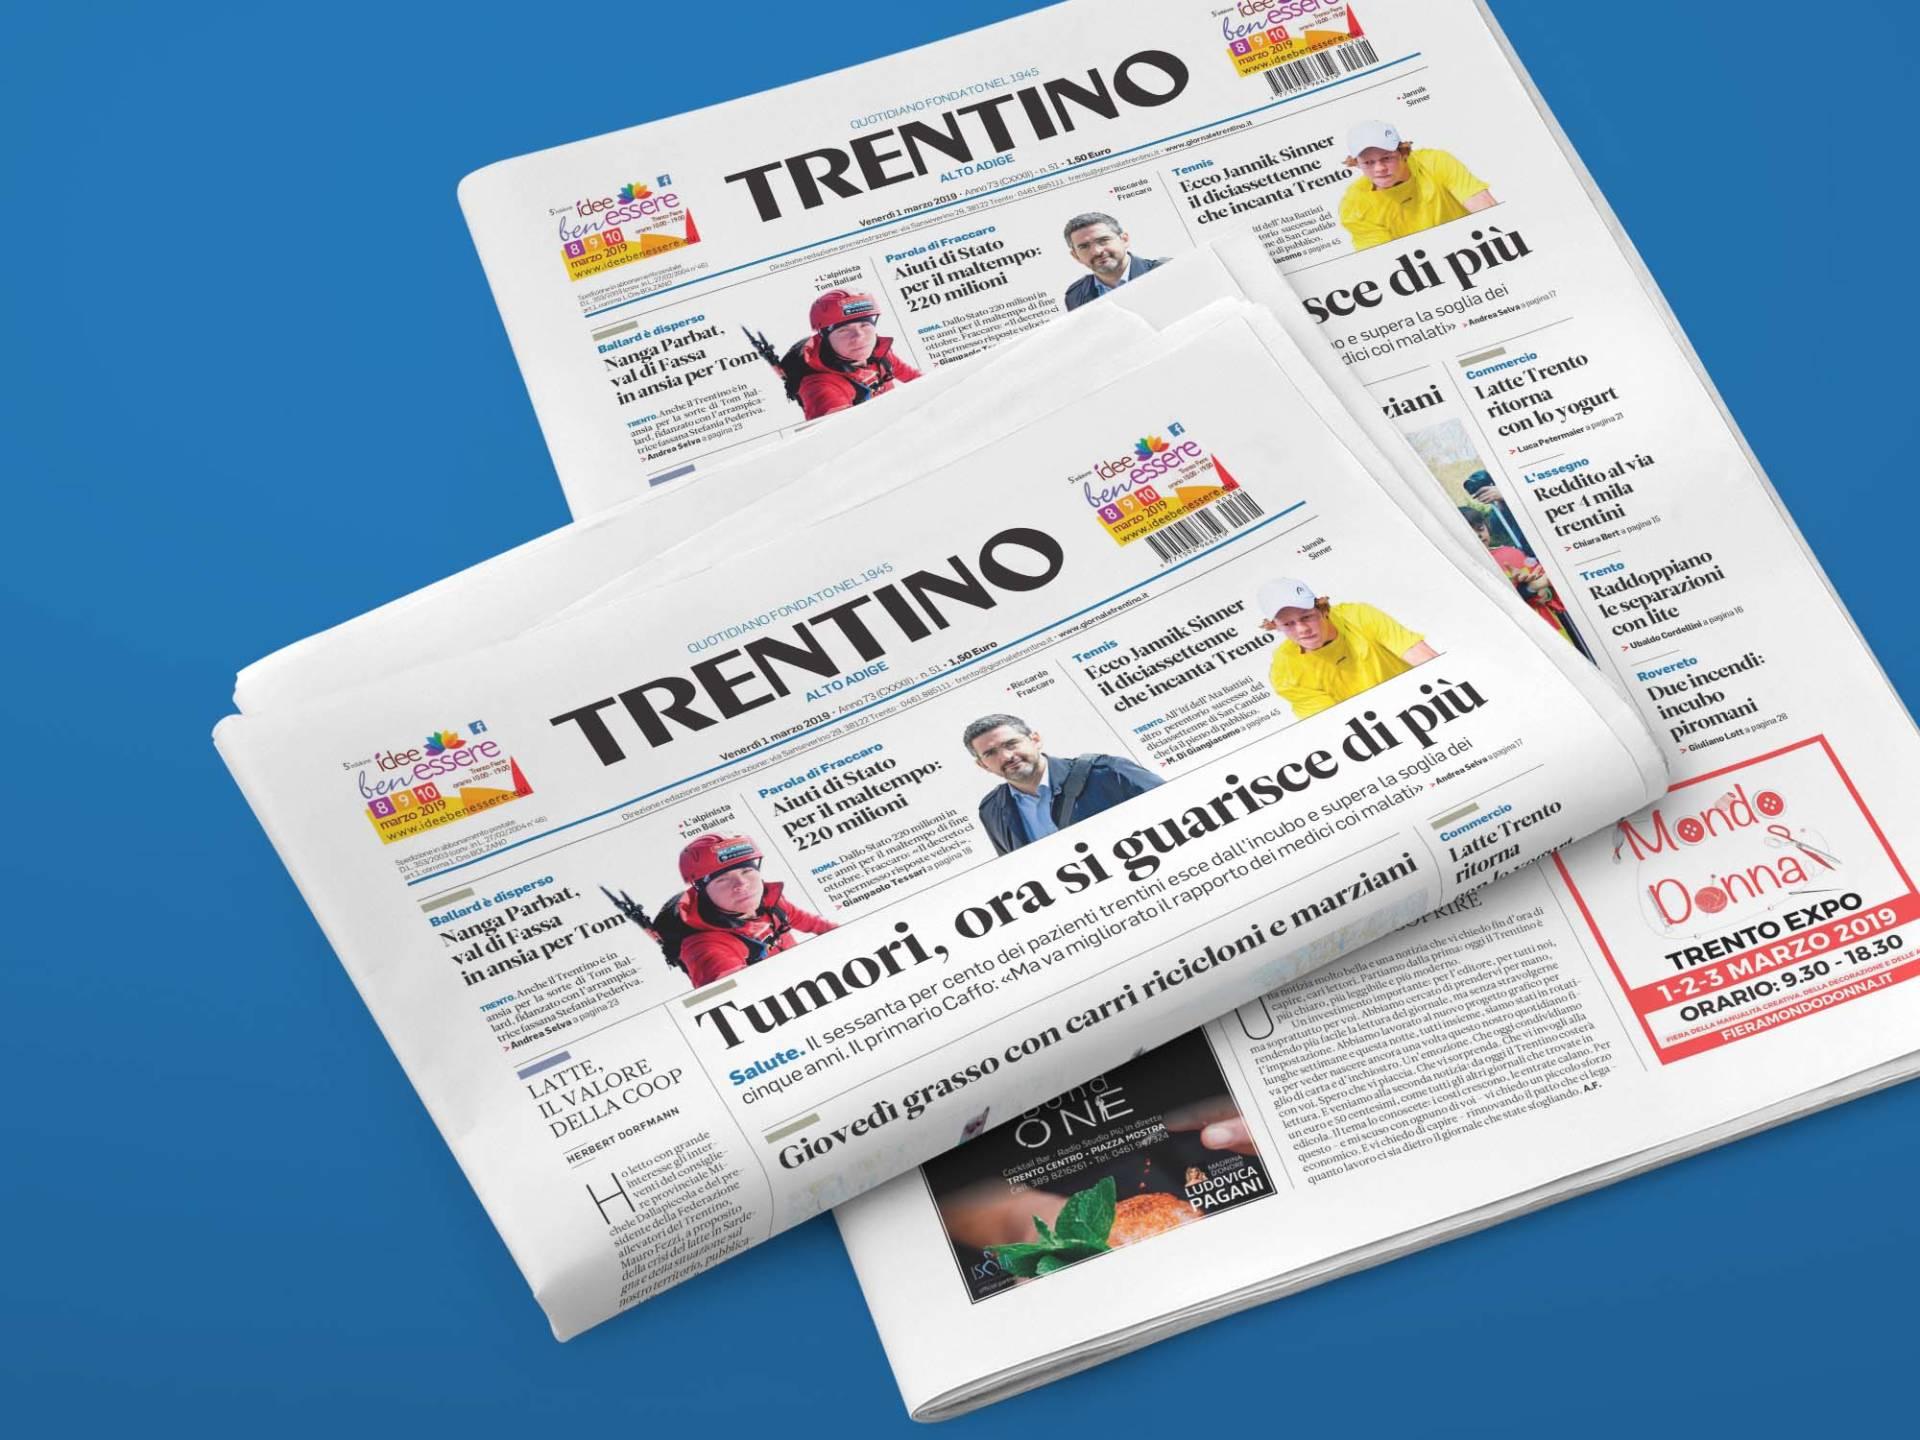 Trentino_01_Wenceslau_News_Design